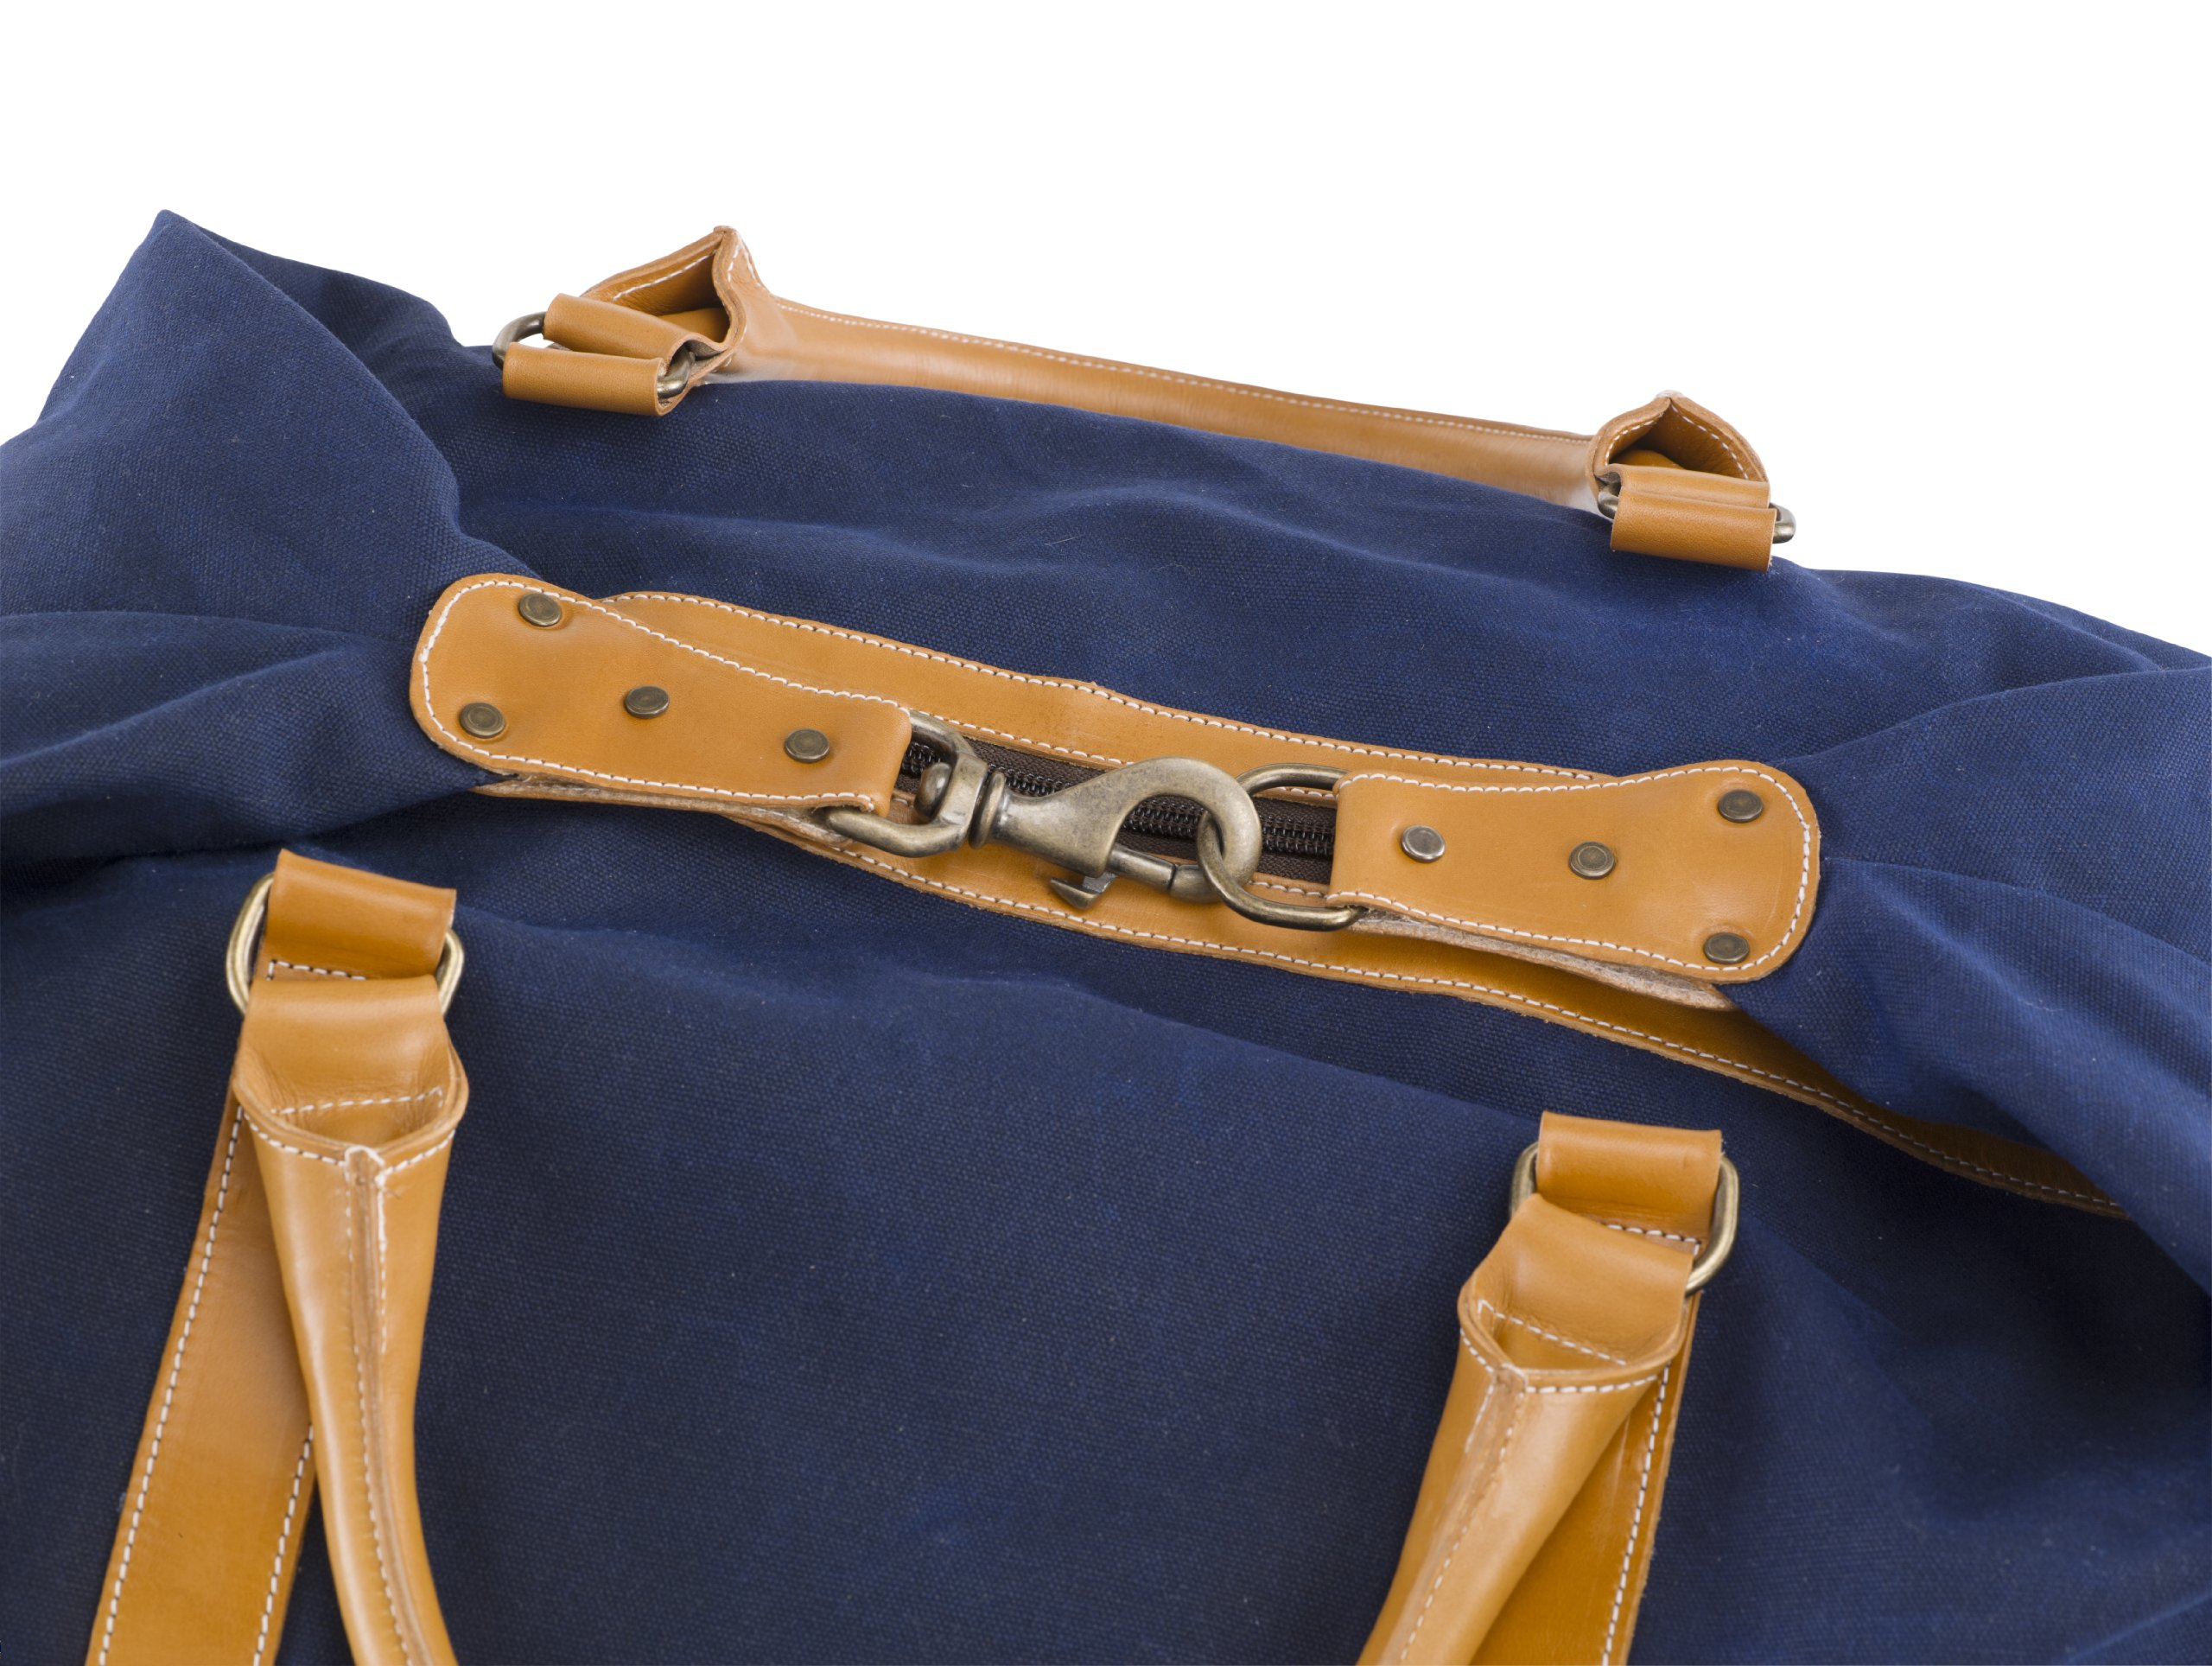 BELDING American Collection Satchel Duffle Bag, Navy by BELDING (Image #3)